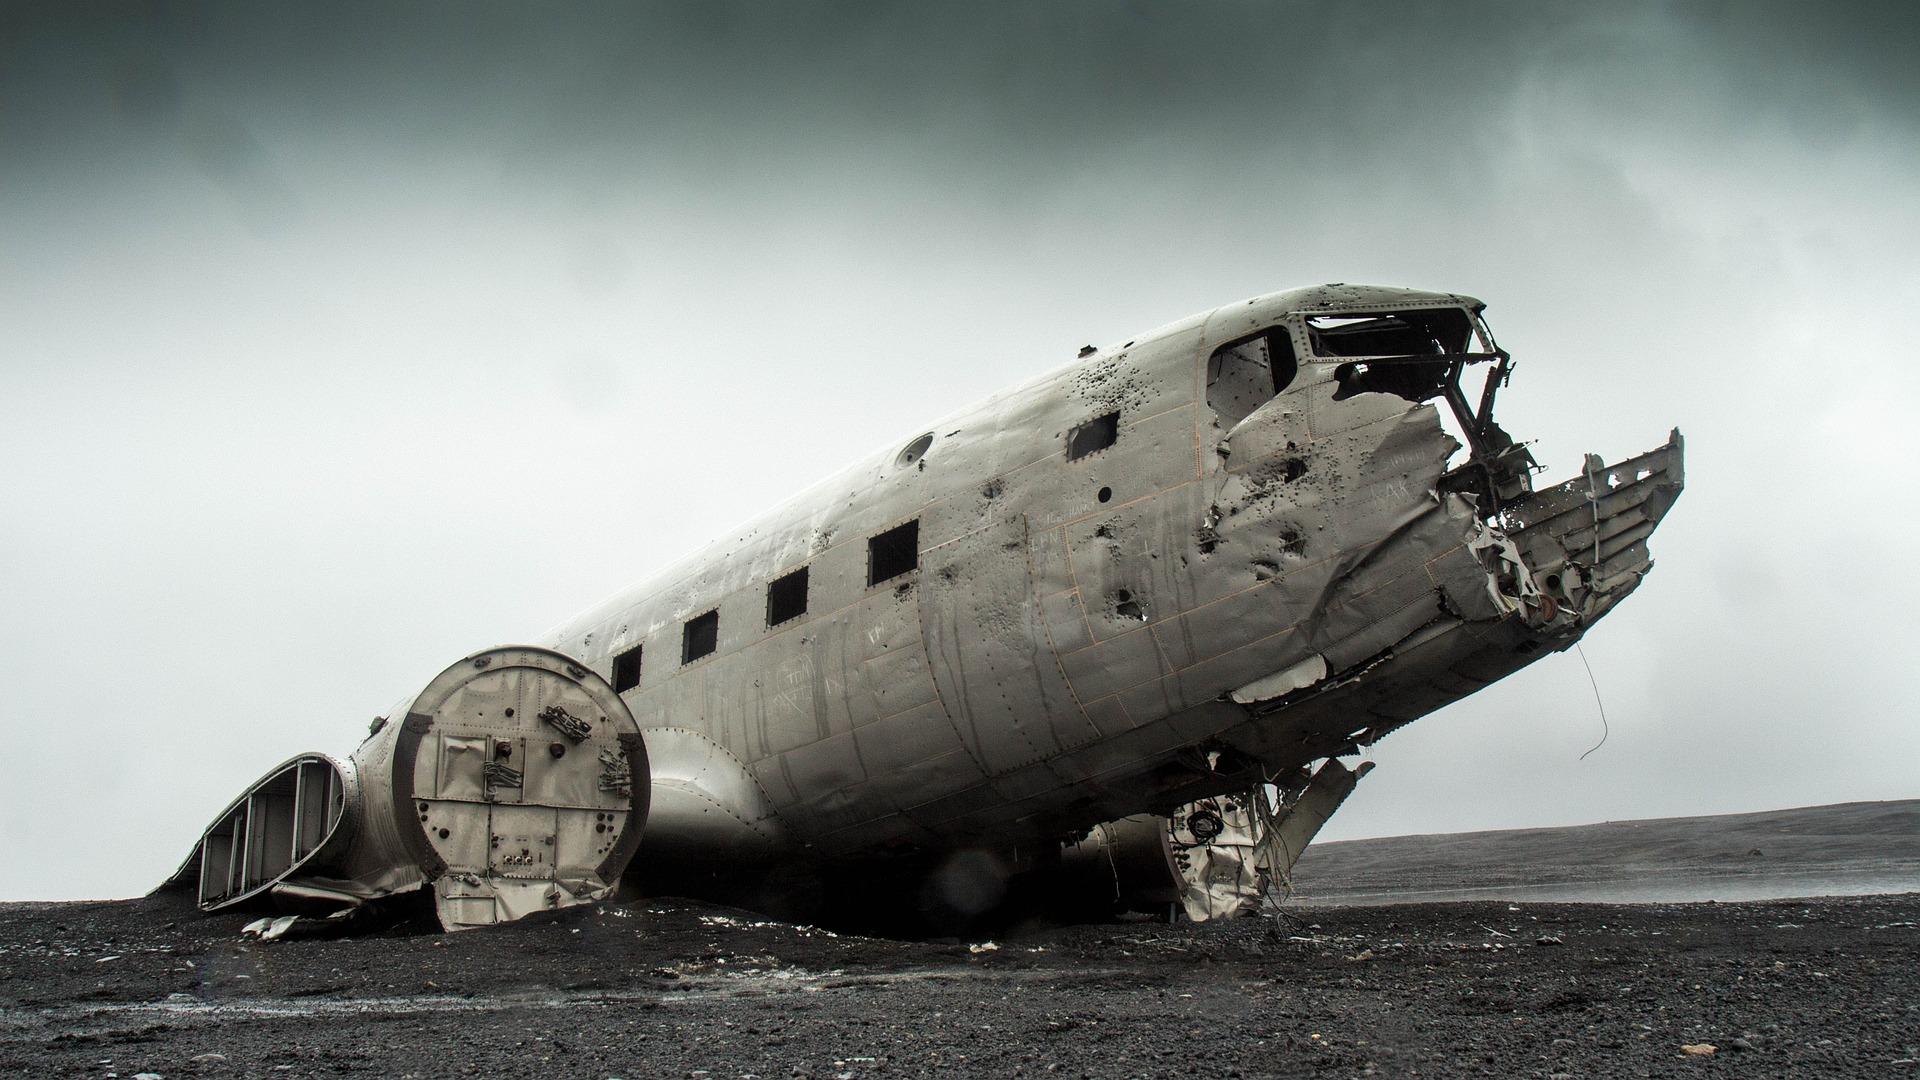 airplane-731126_1920.jpg